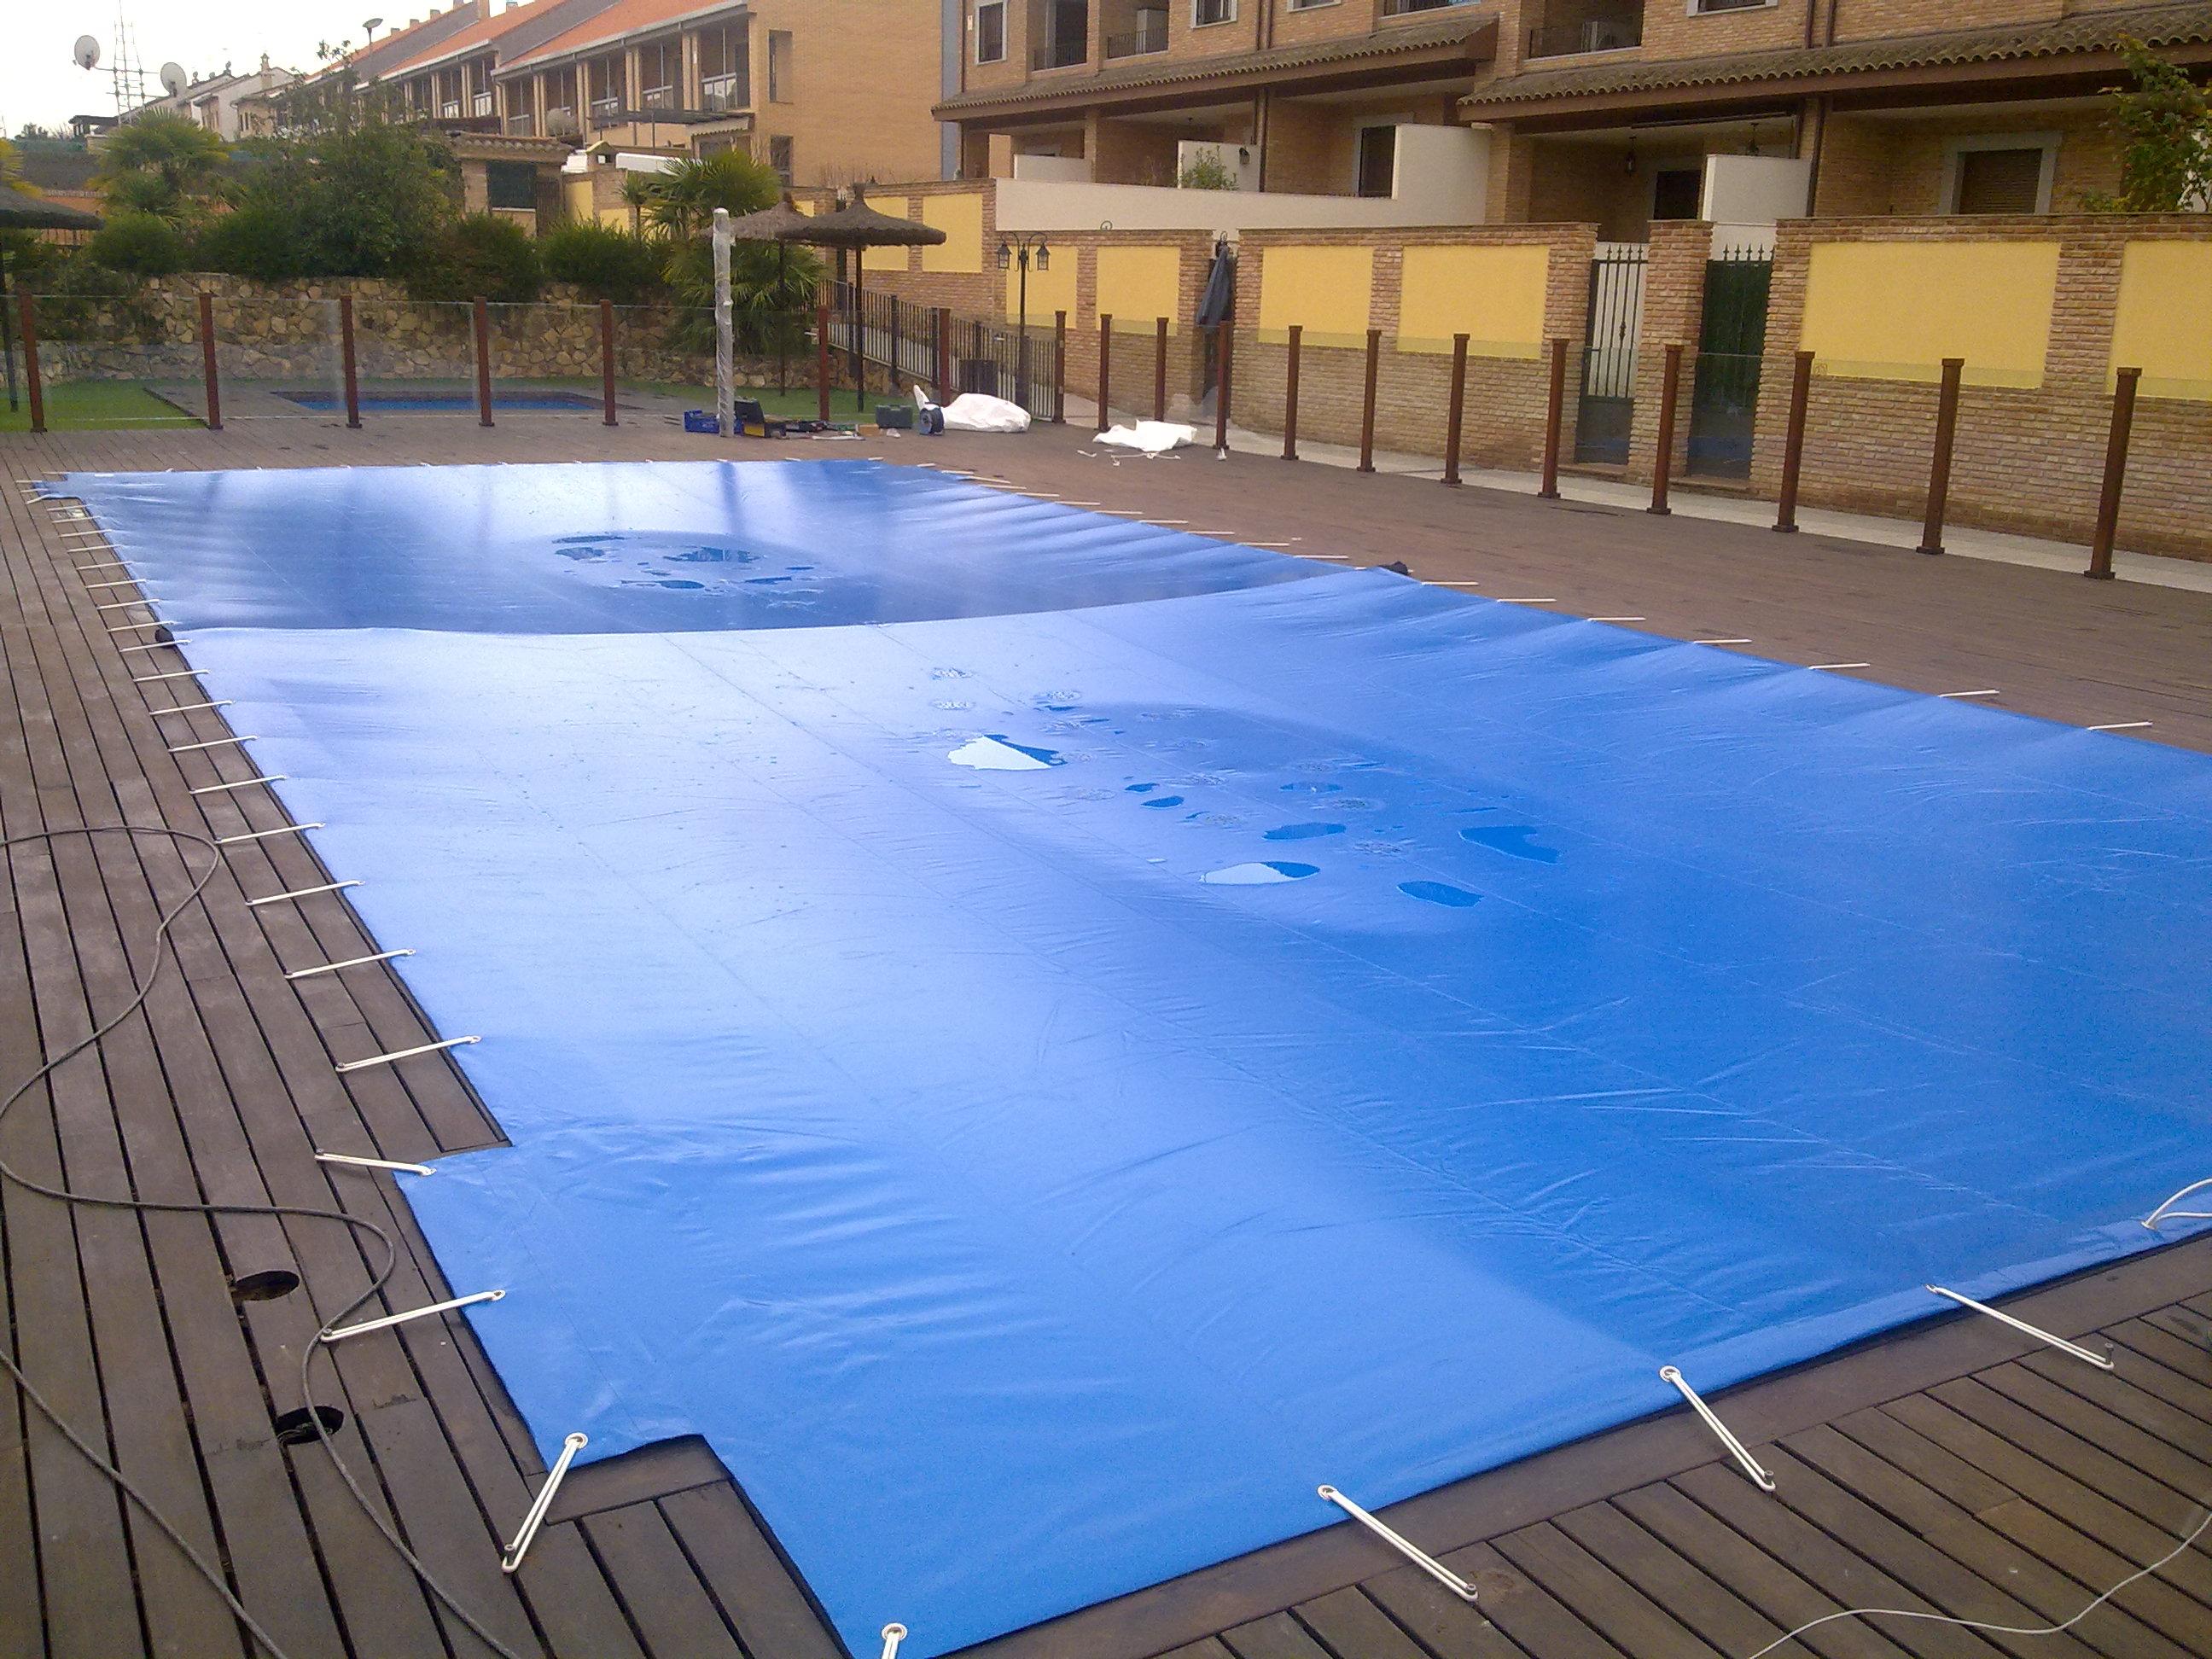 Tapar piscina gallery of with tapar piscina gallery of for Cobertores para piletas